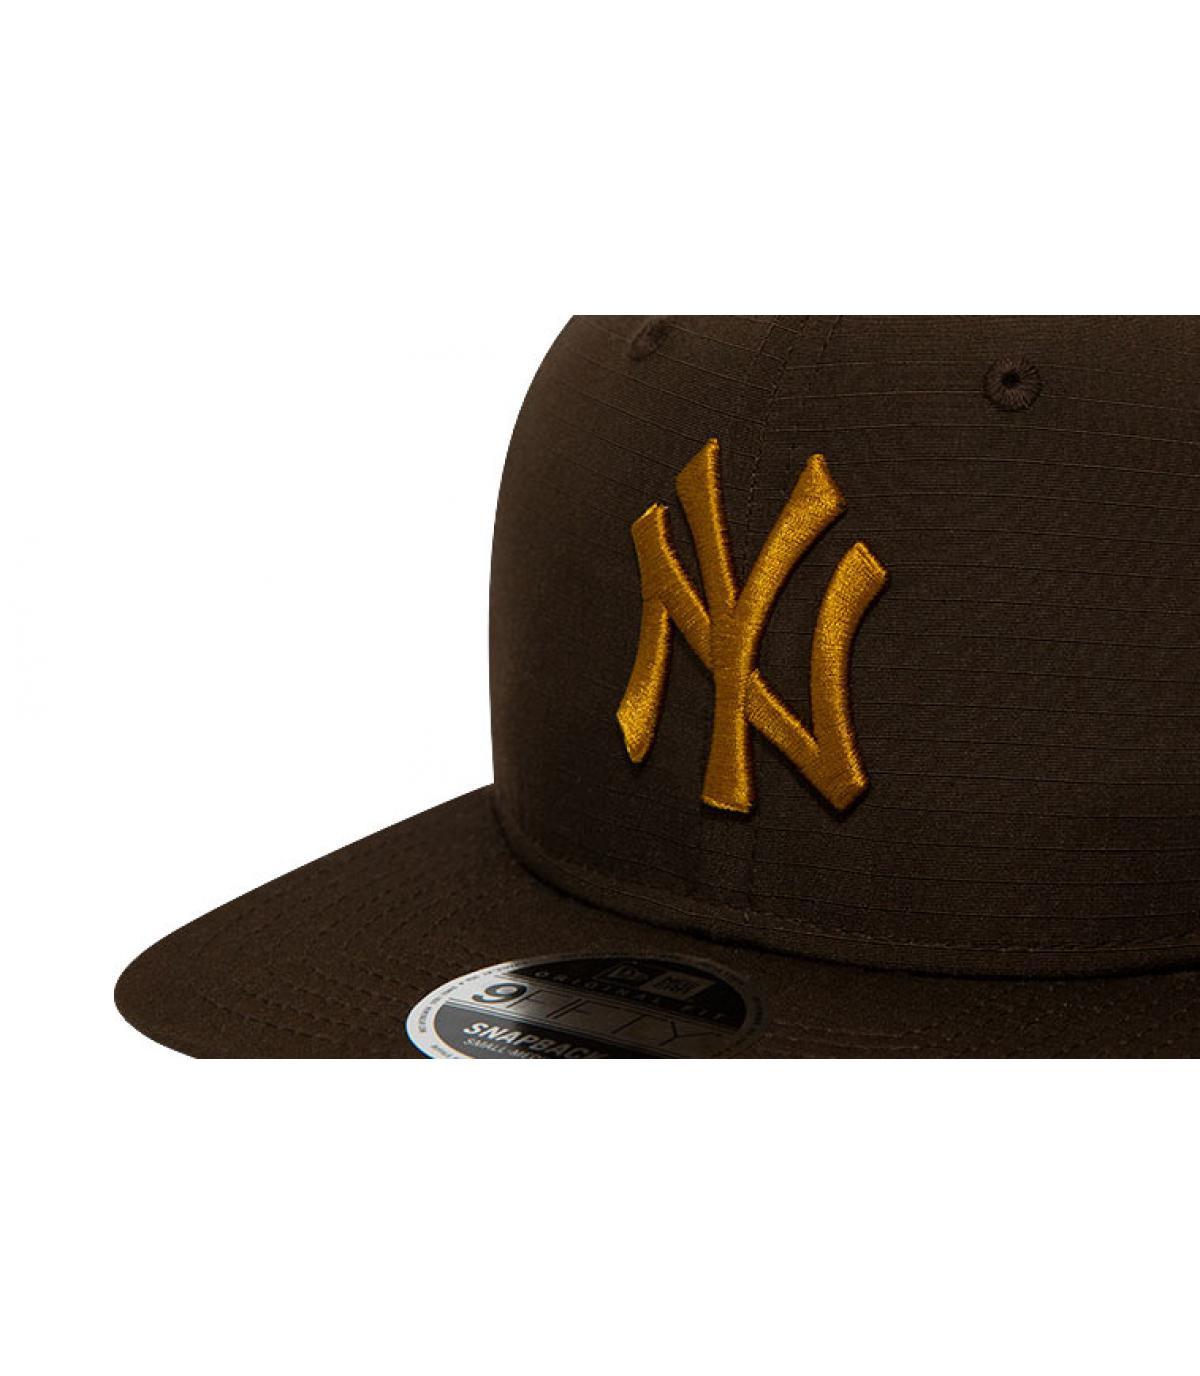 Détails Snapback MLB Utility NY 950 brown old gold - image 3